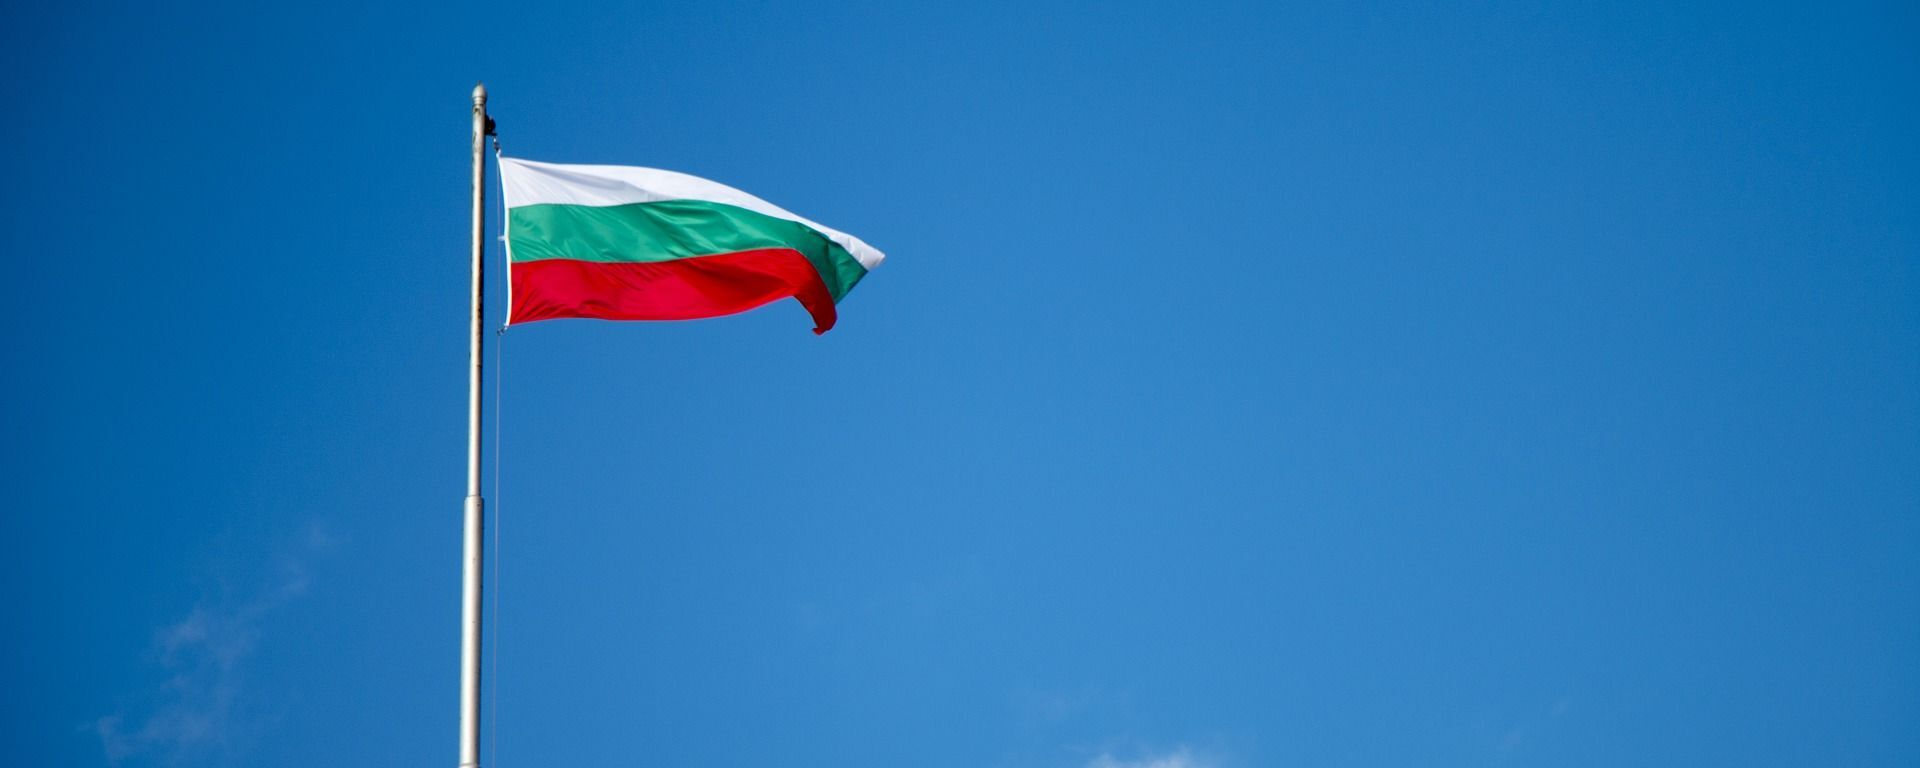 Zastava Bugarske - Sputnik Srbija, 1920, 27.07.2021